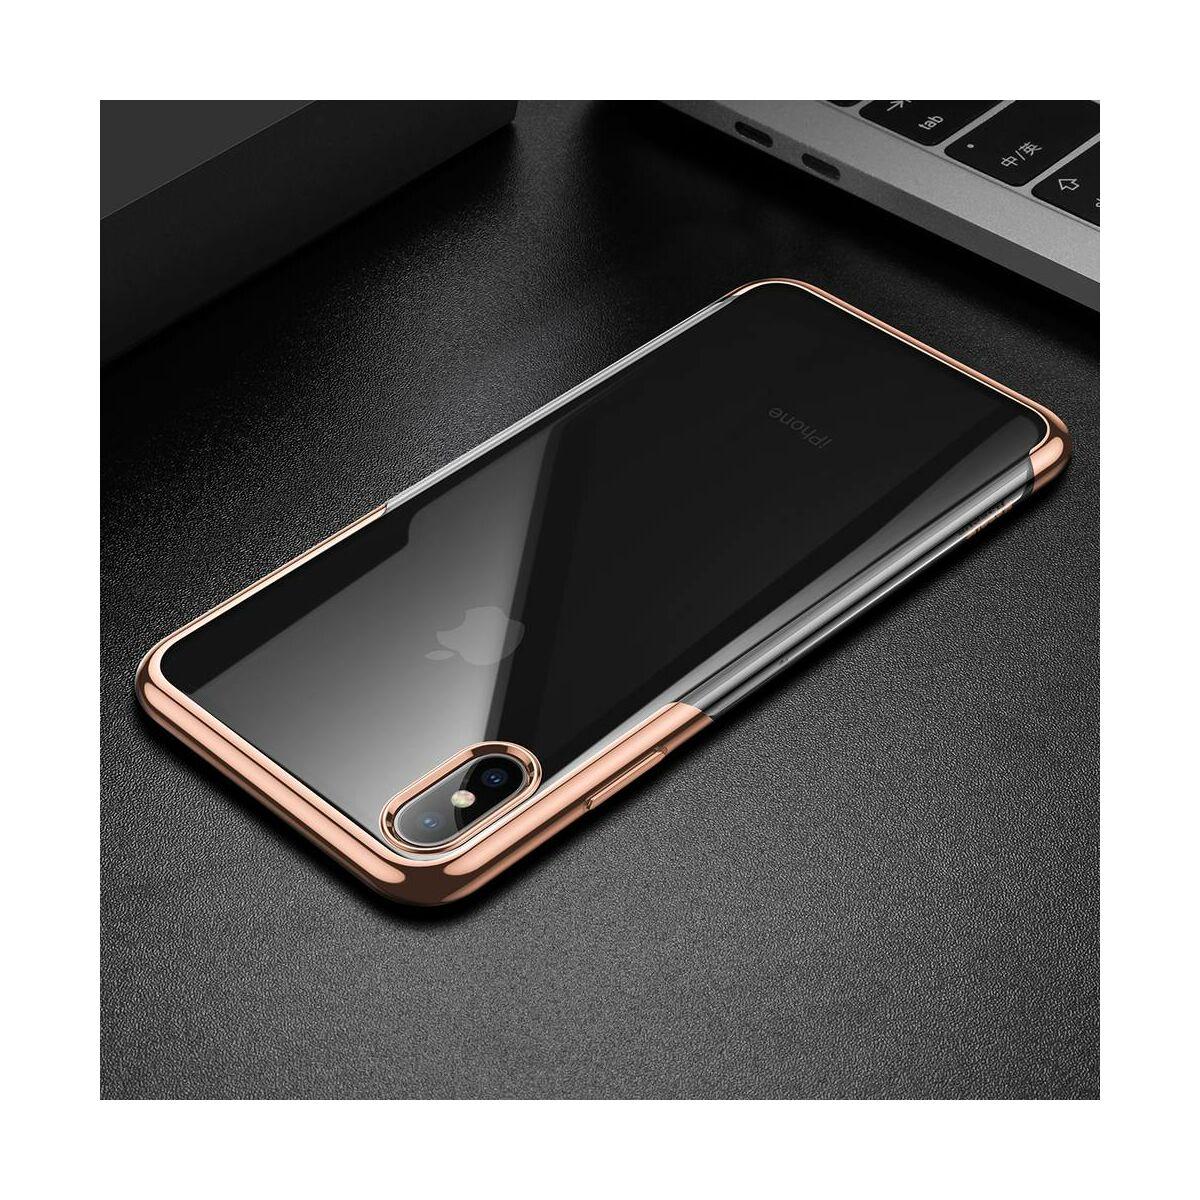 Baseus iPhone XS Max tok, Shining, arany (ARAPIPH65-MD0V)